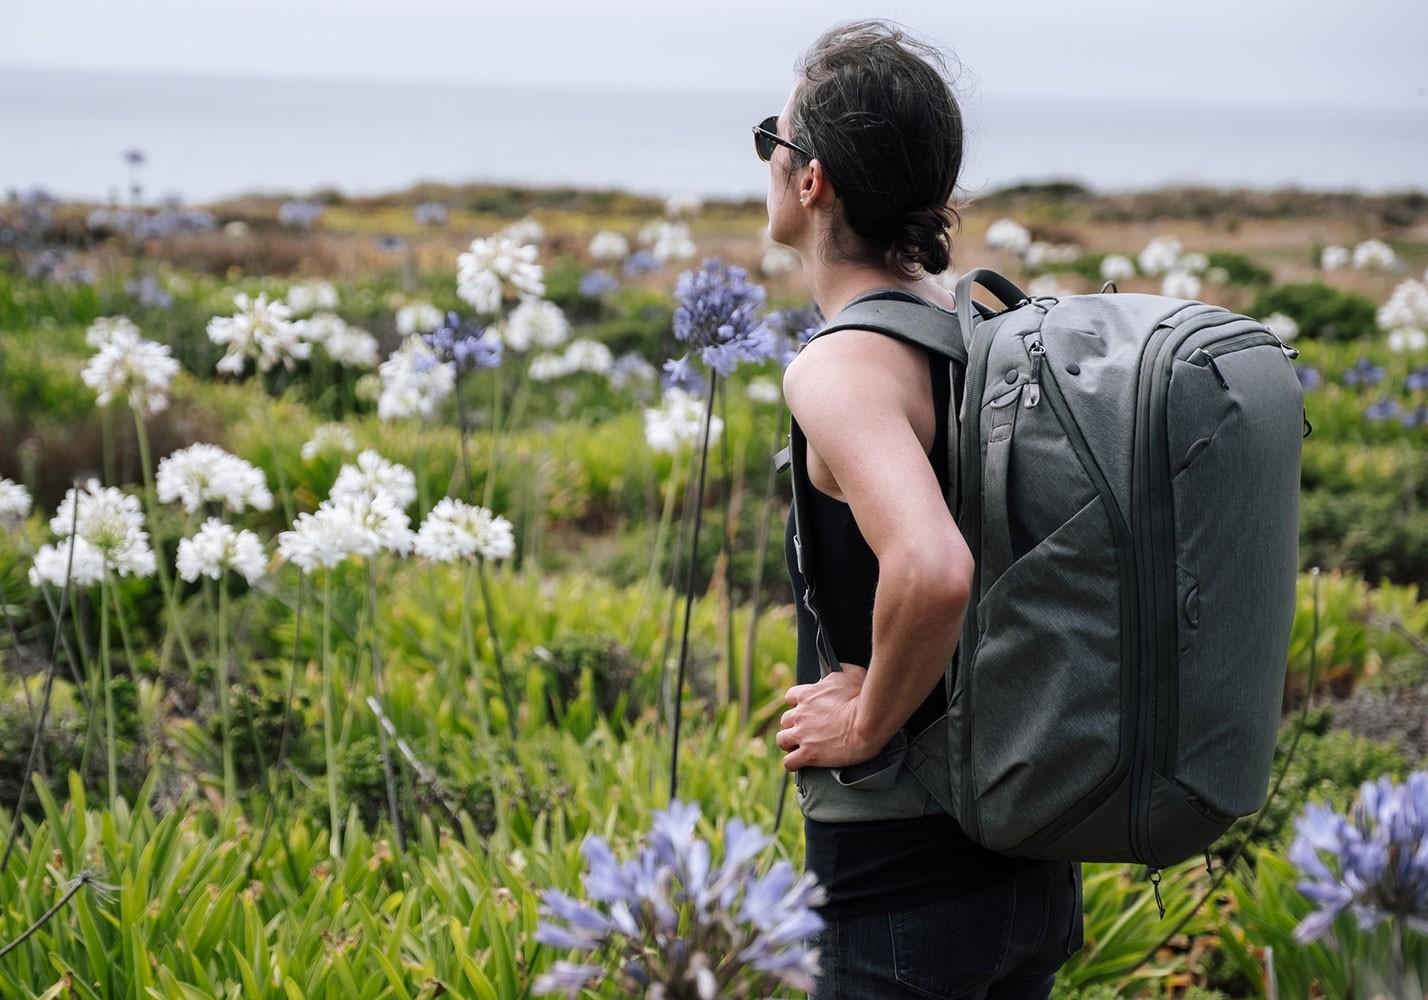 peak design travel backpack review image